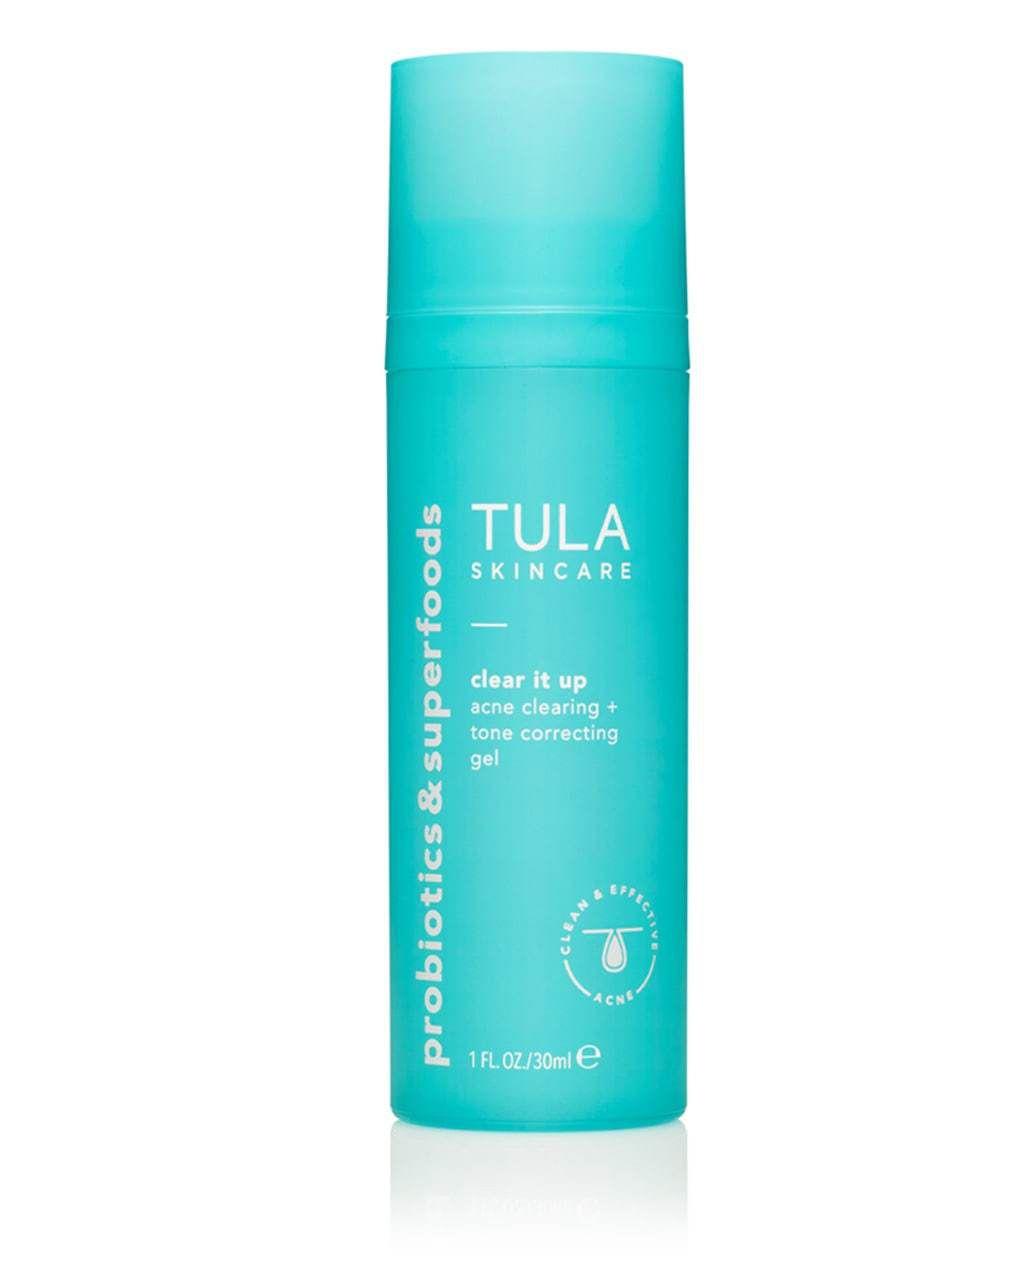 Tula Acne Clearing + Tone Correcting Gel